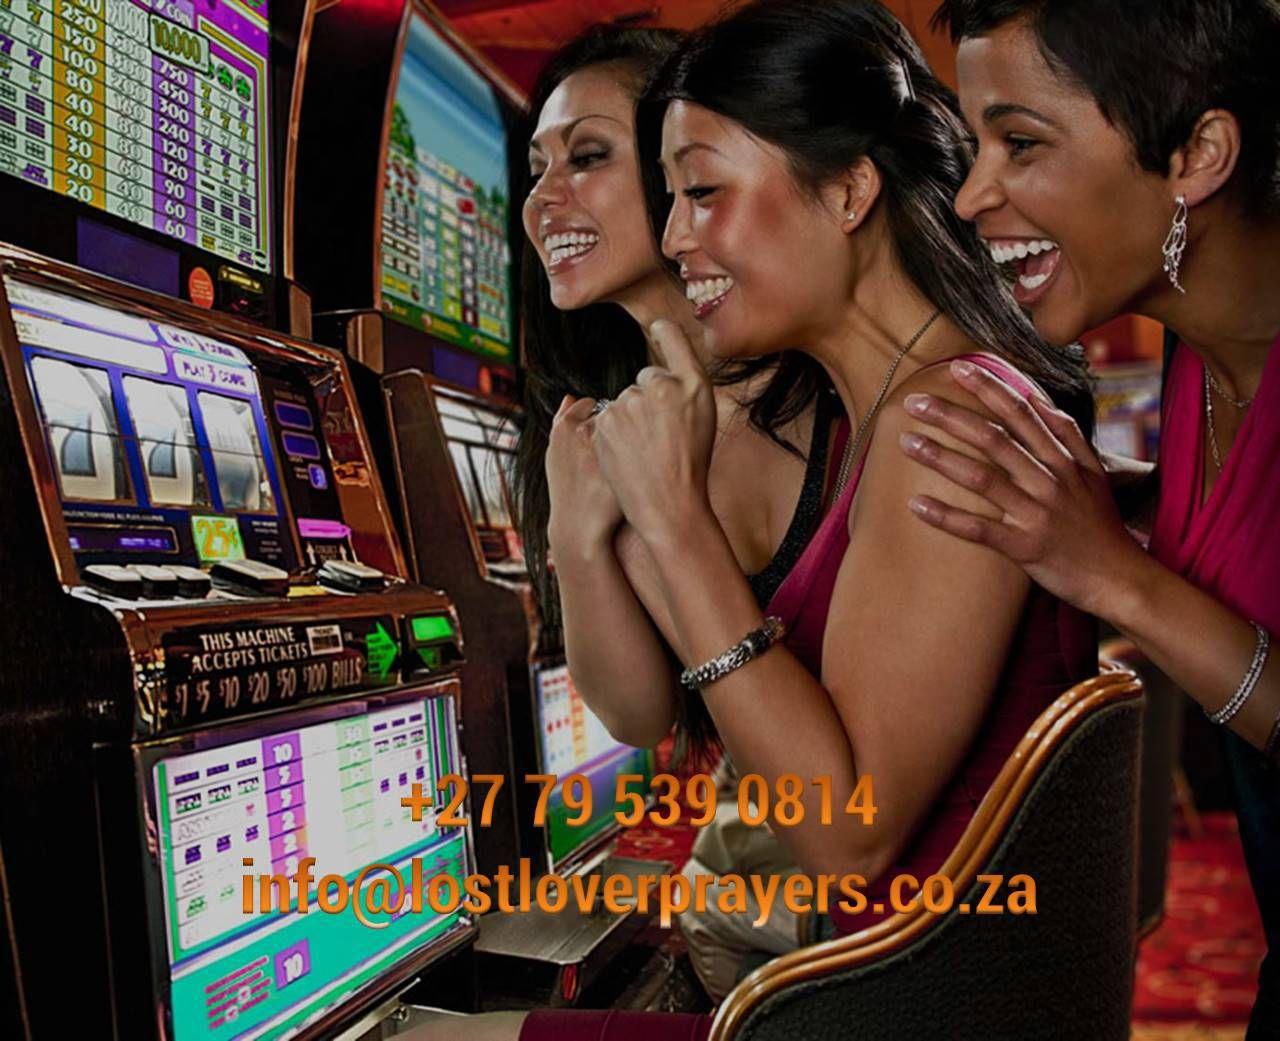 golden lion casino no deposit bonus 2019 Crevillente